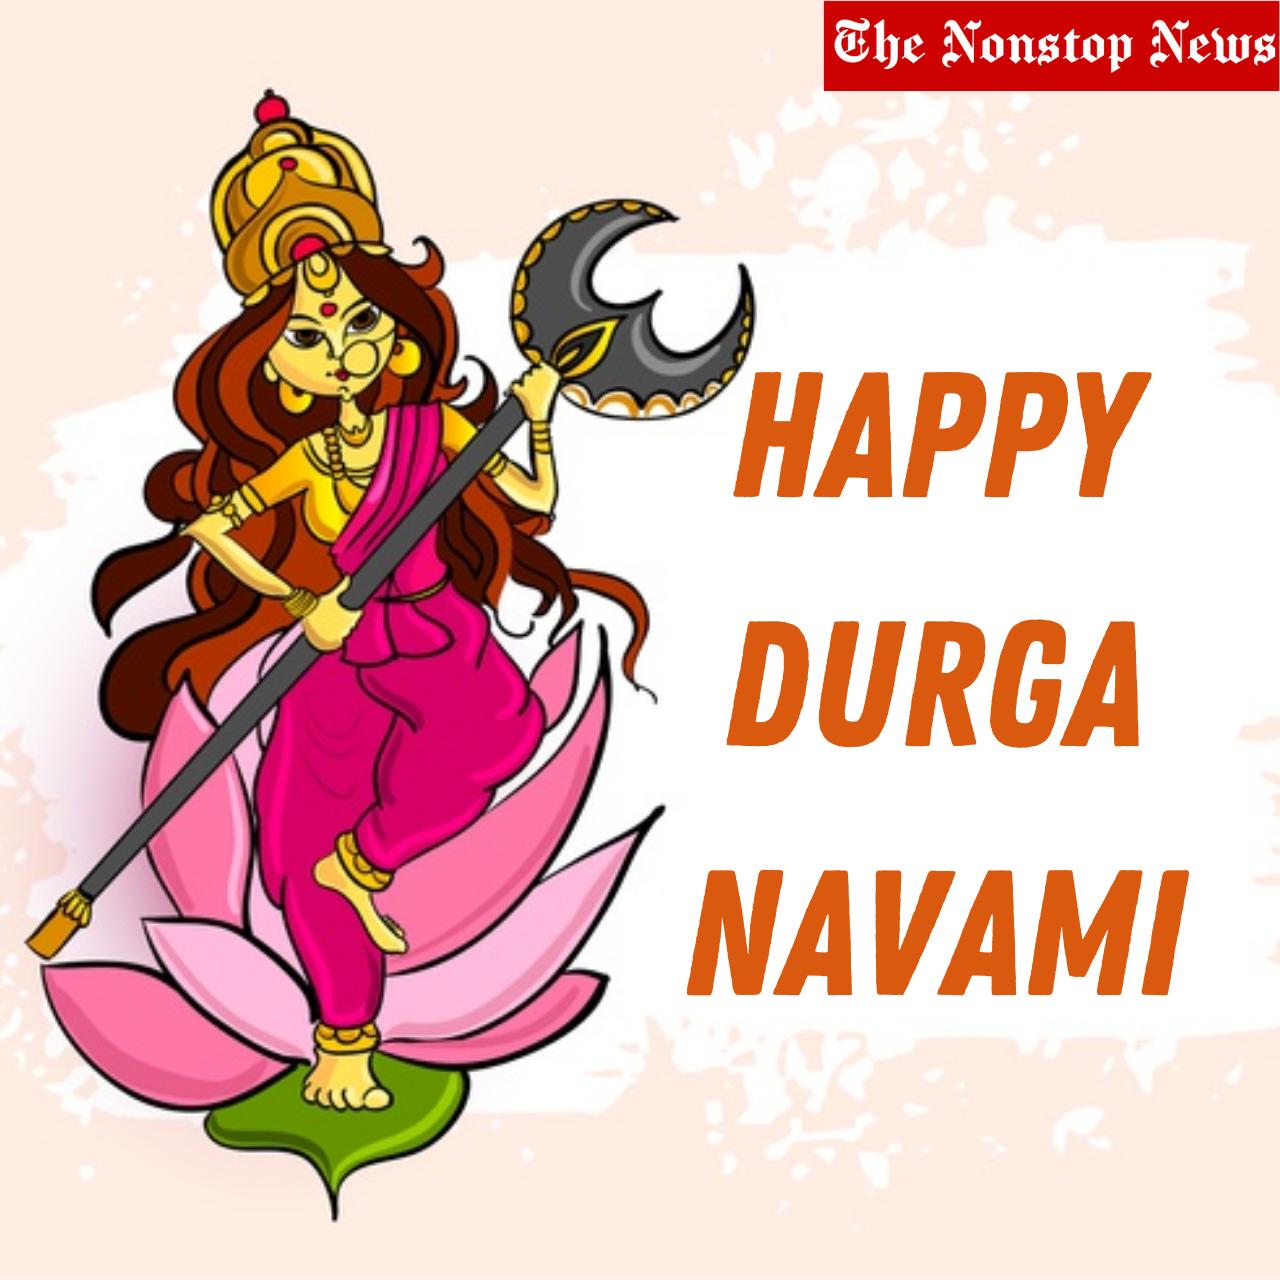 Happy Durga Navami 2021 WhatsApp Status Video Download for Maha Navami